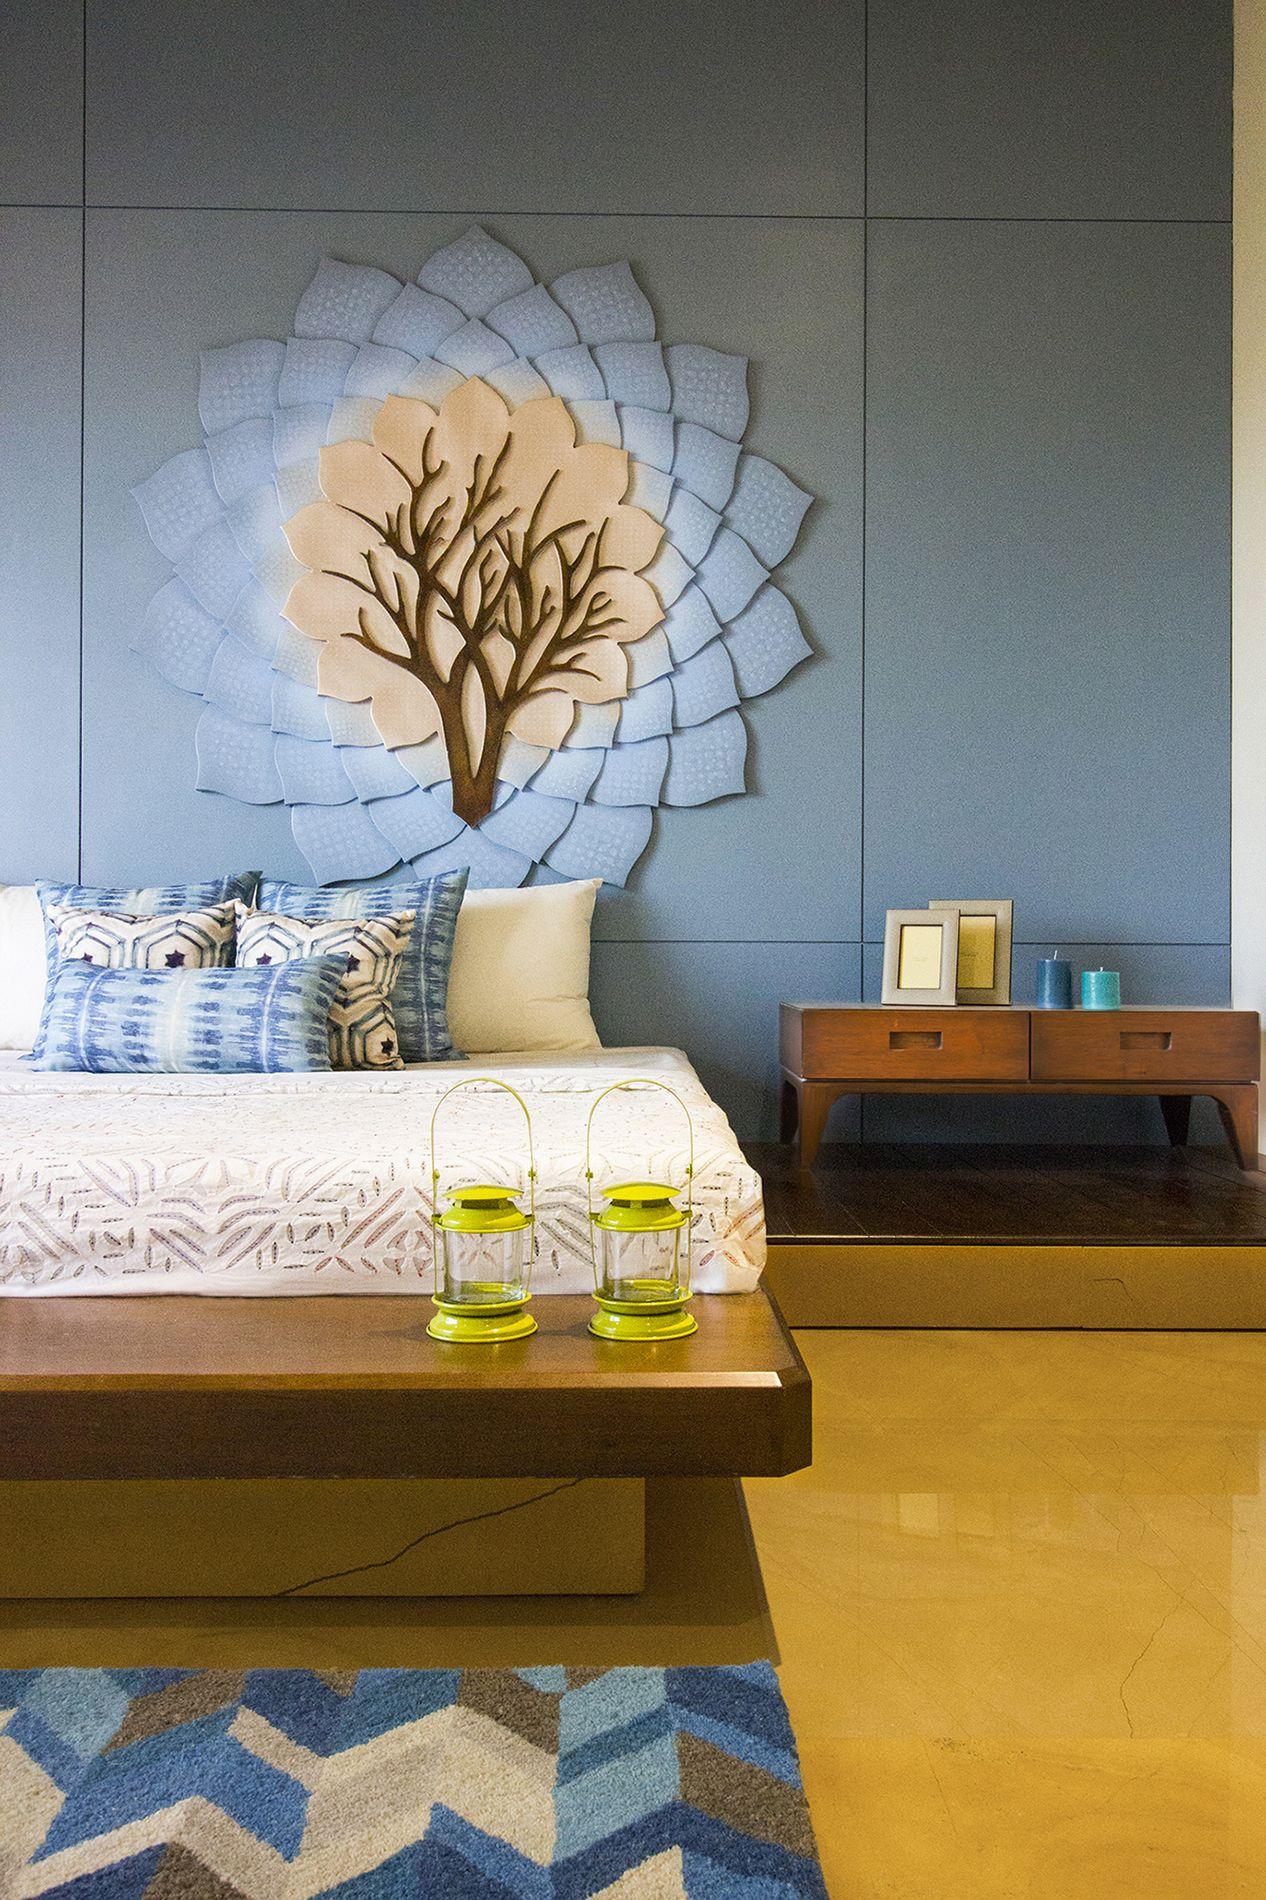 Inside out house    associates wall treatments design also elegant bedroom concept ideas pinterest rh